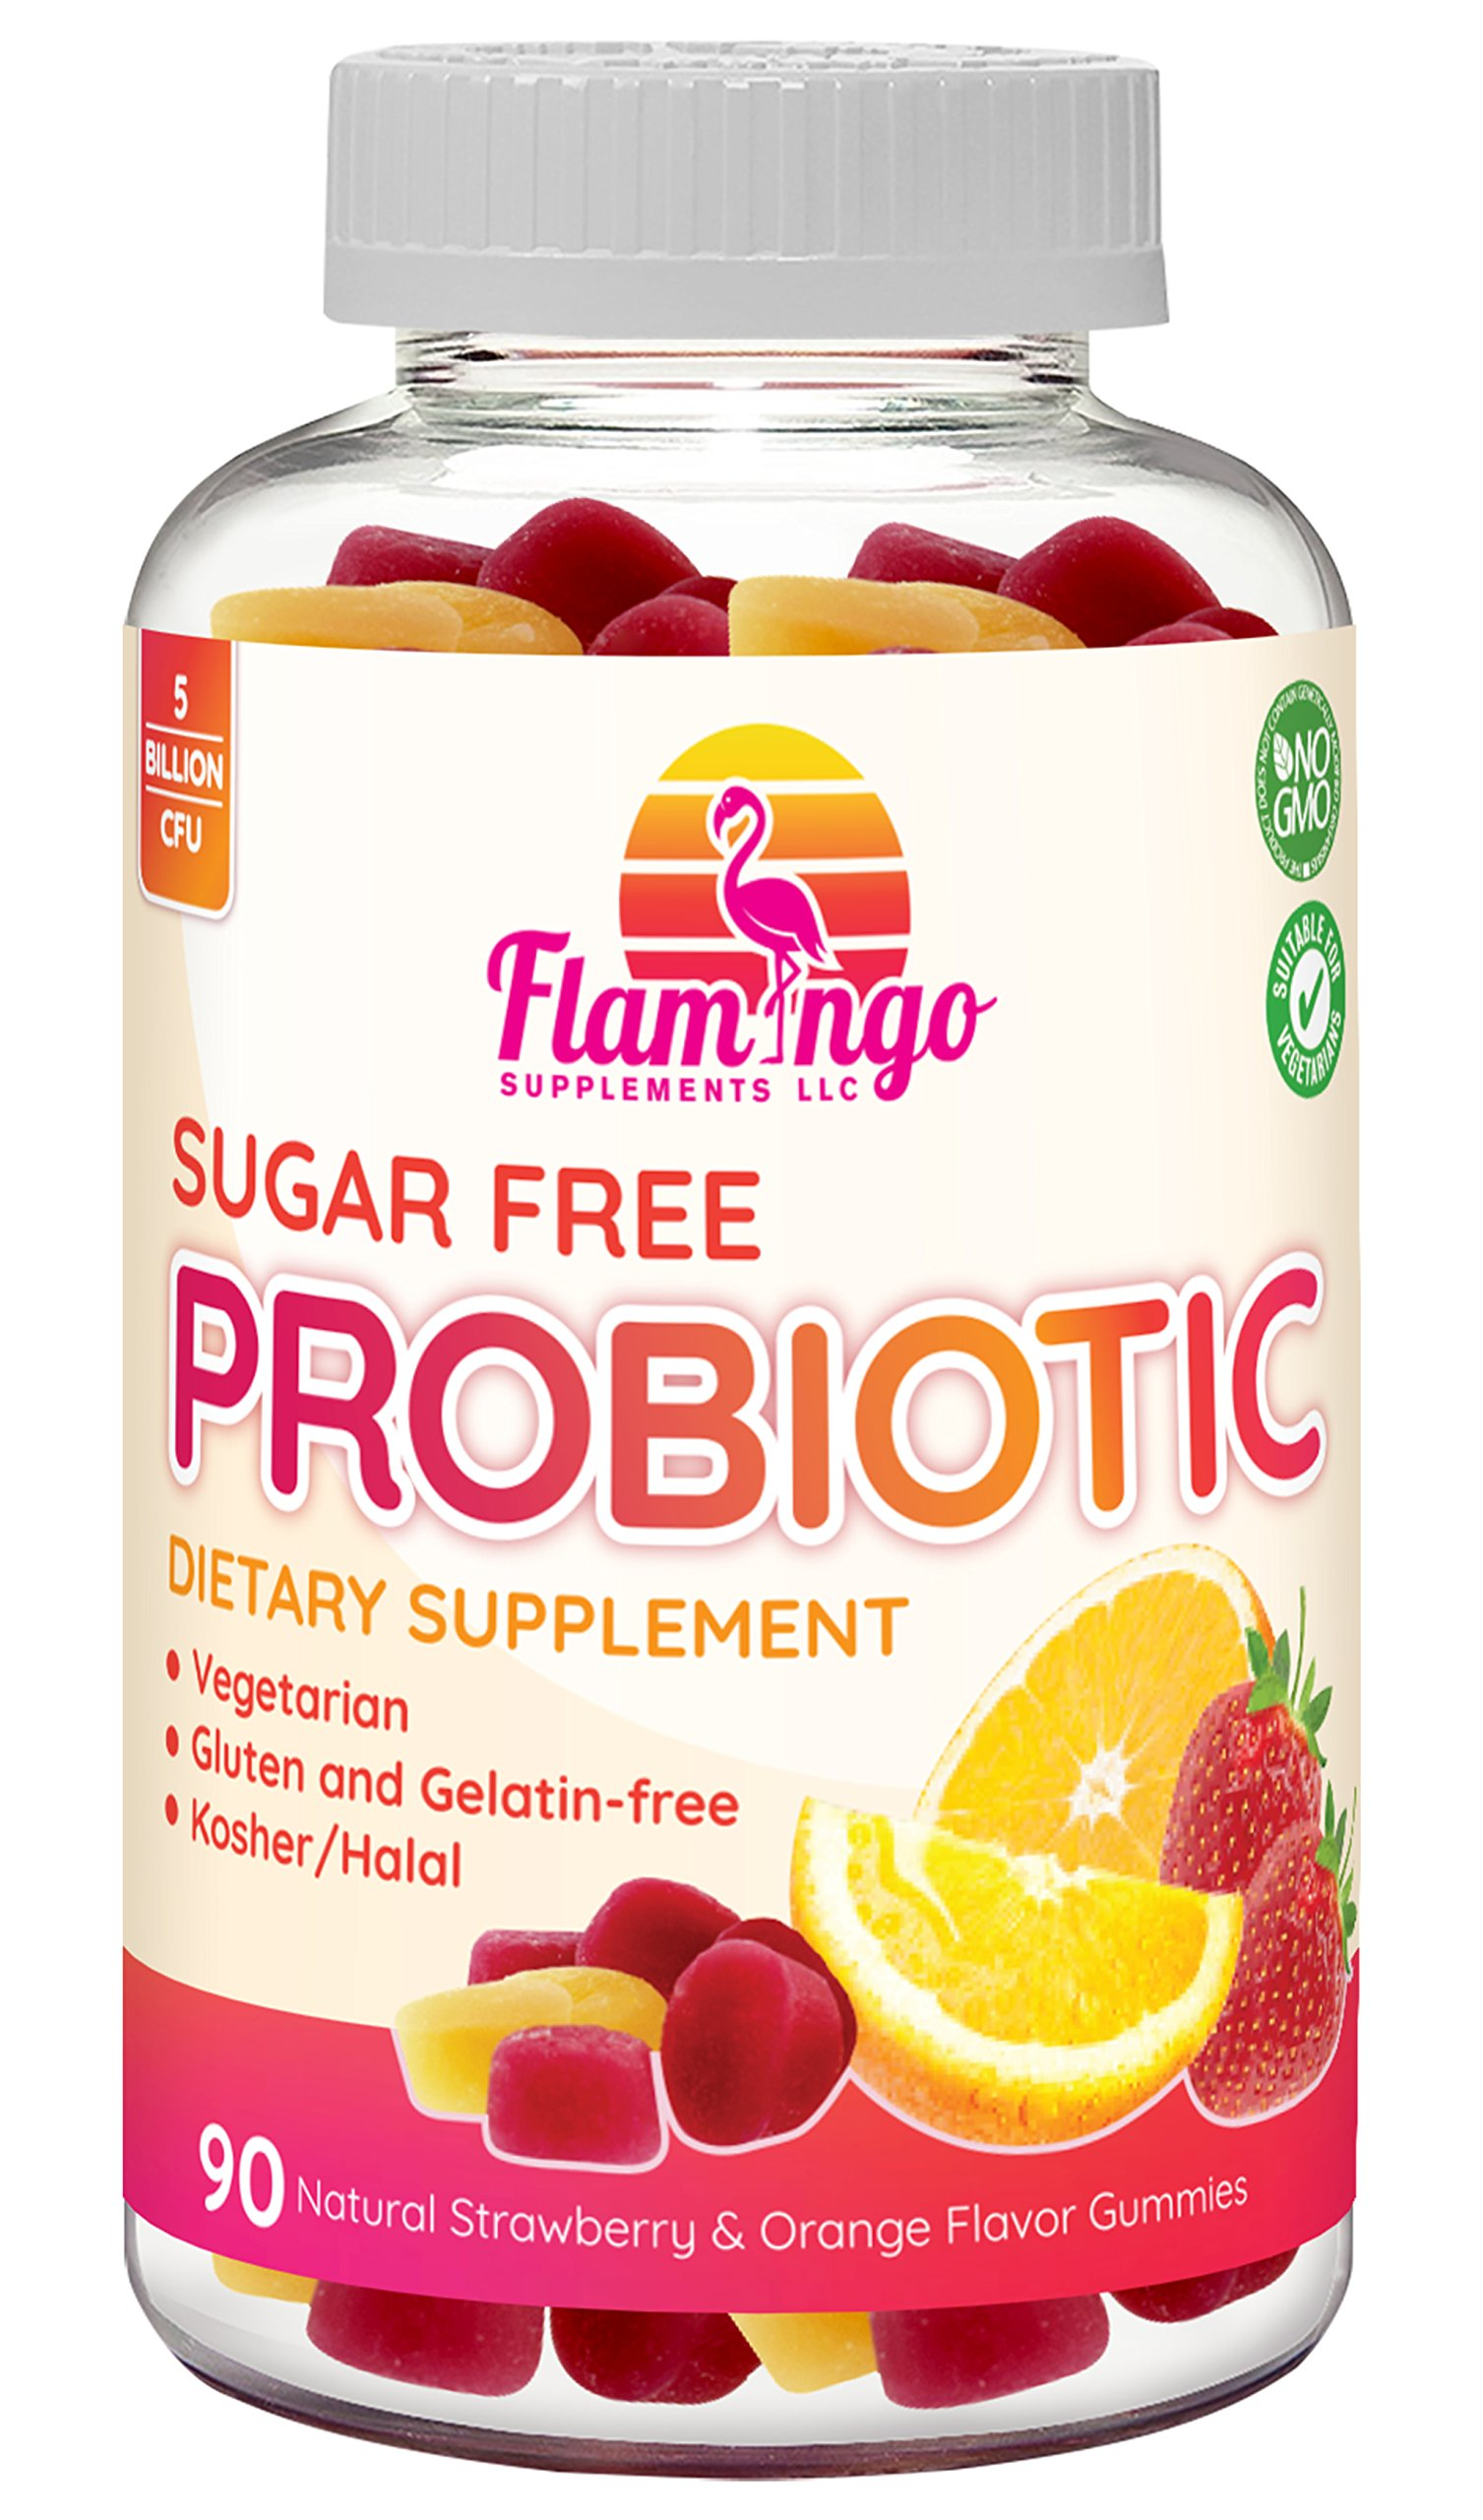 Flamingo Supplements - Sugar Free Probiotic Gummies - 5 Billion CFU, Non GMO, Vegetarian (NO Gelatin or Gluten) and Kosher. For Women Men & Kids Digestive and Immune Health | 90 Count